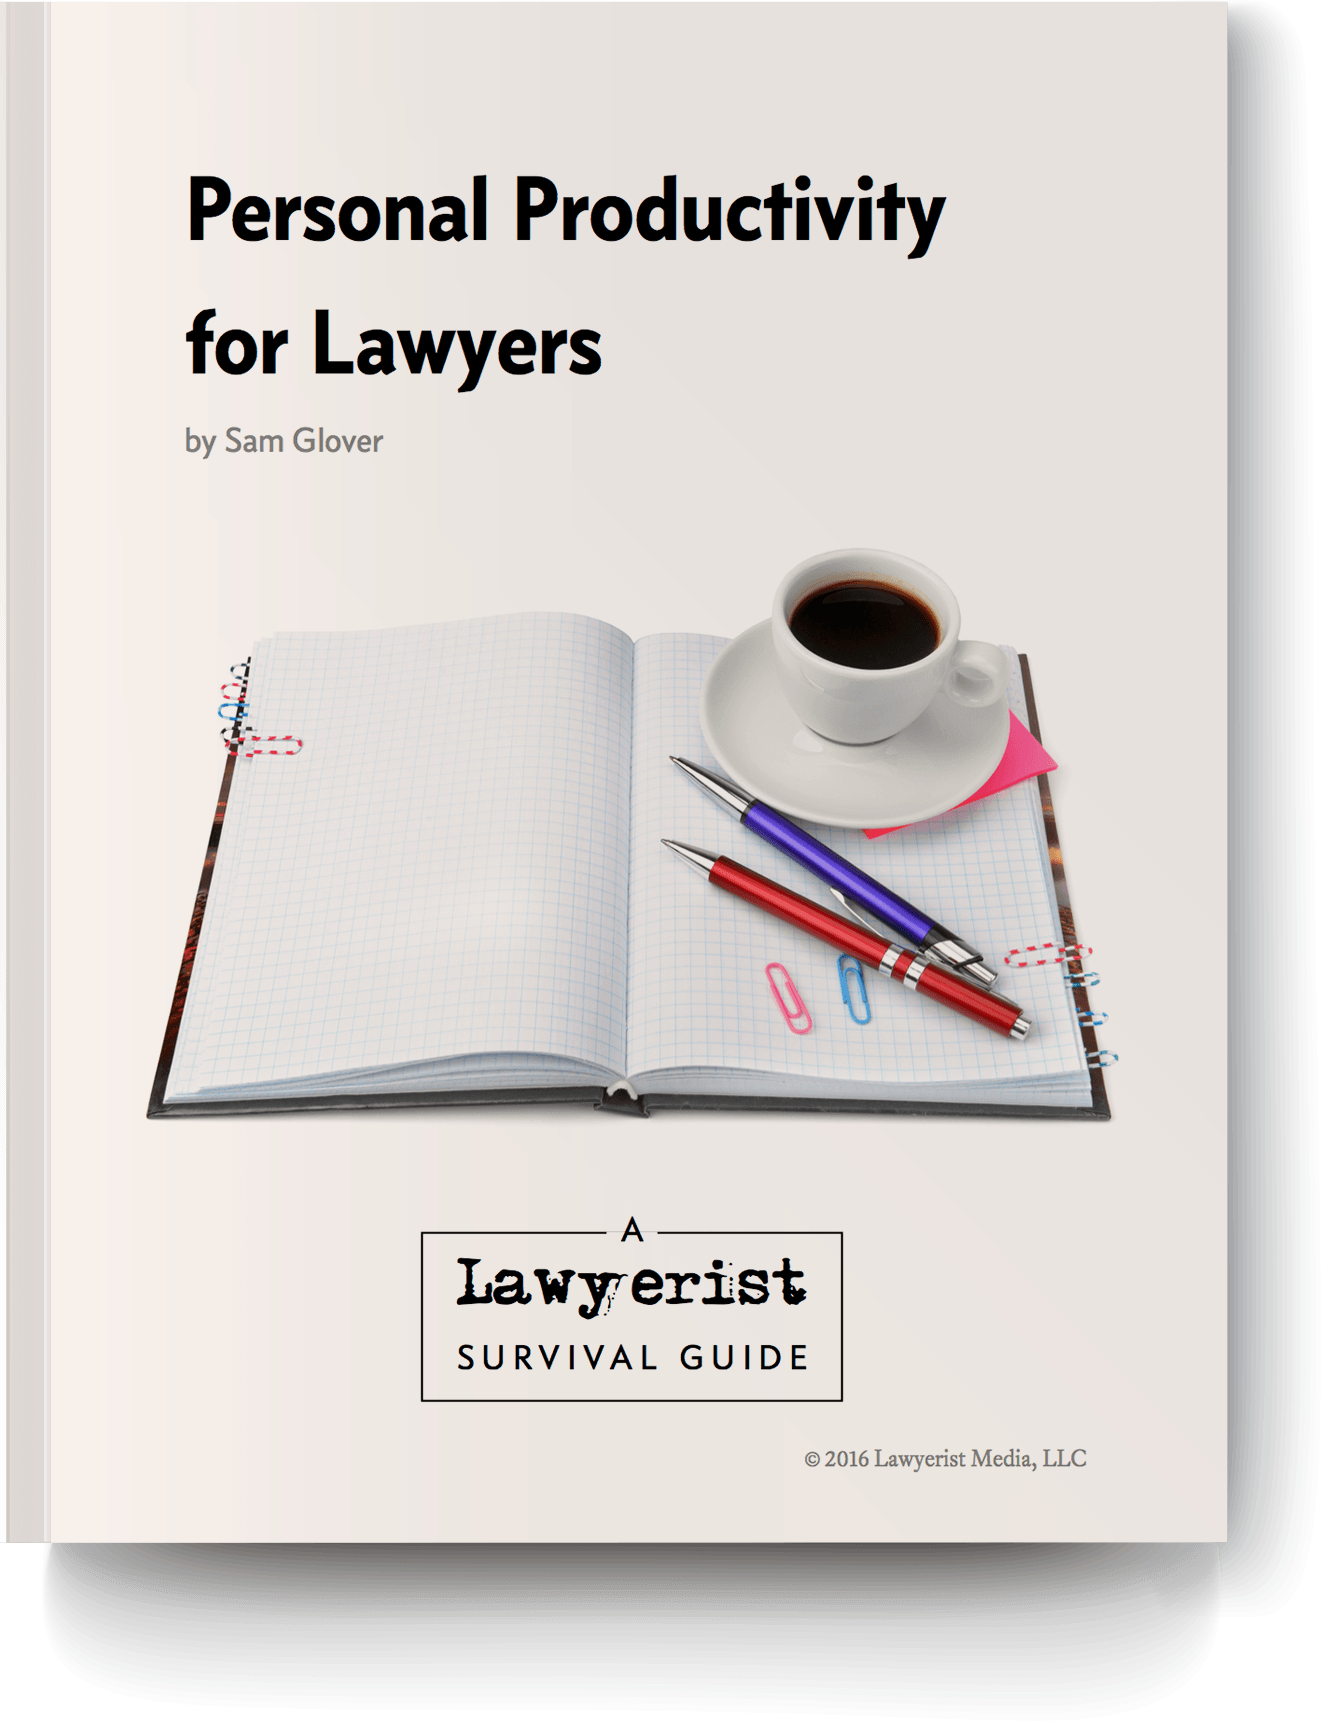 Lawyerist Law Practice Legal Marketing Legal Technology